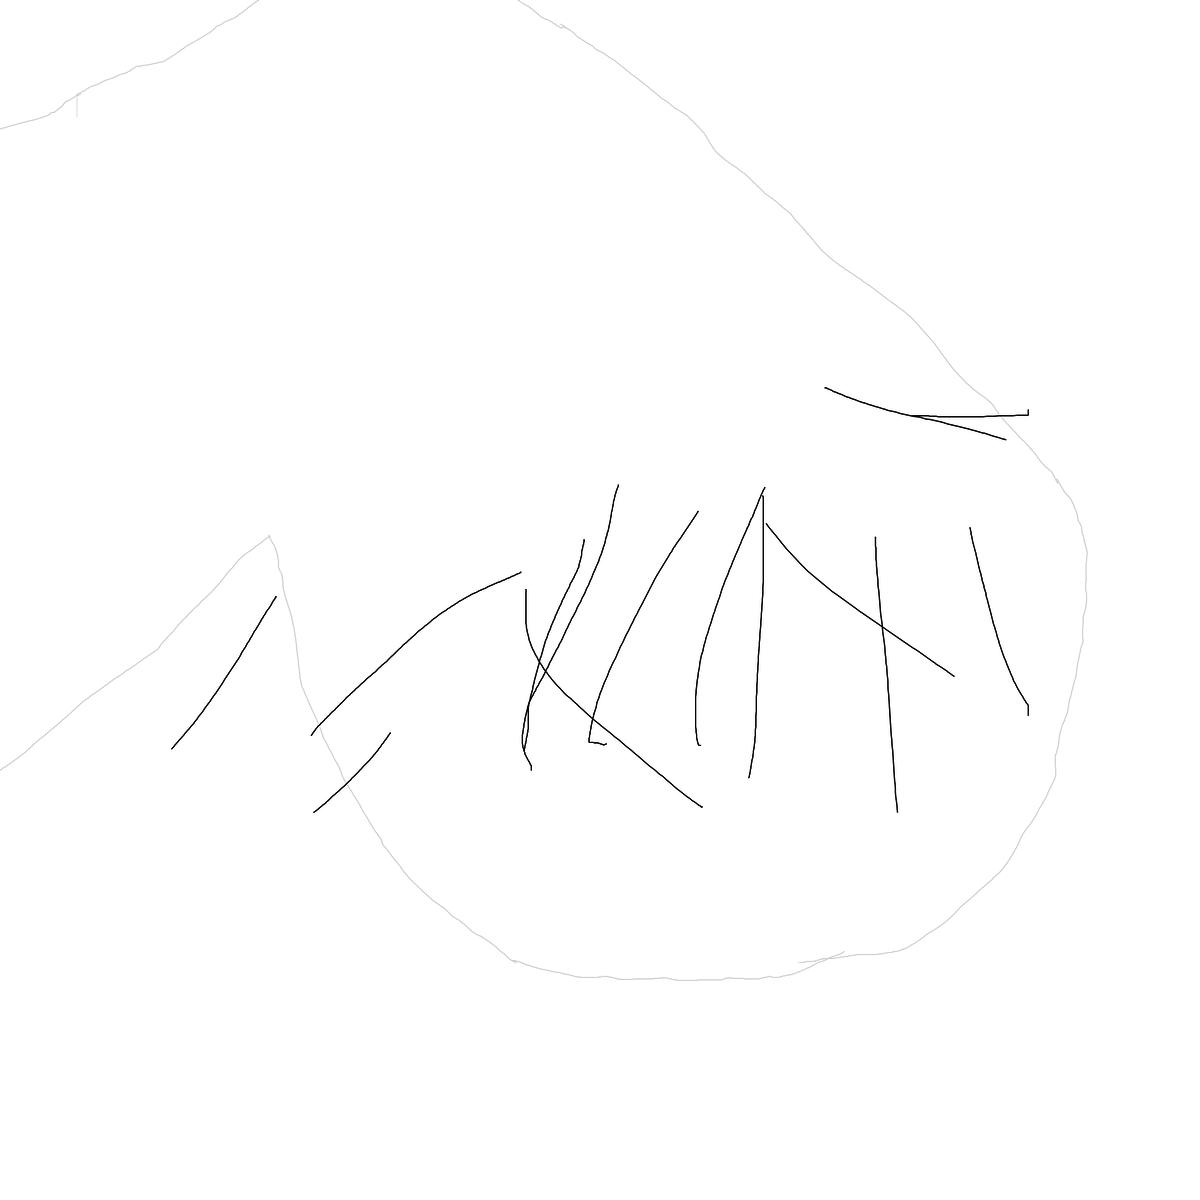 BAAAM drawing#16082 lat:39.0971336364746100lng: -84.5064163208007800